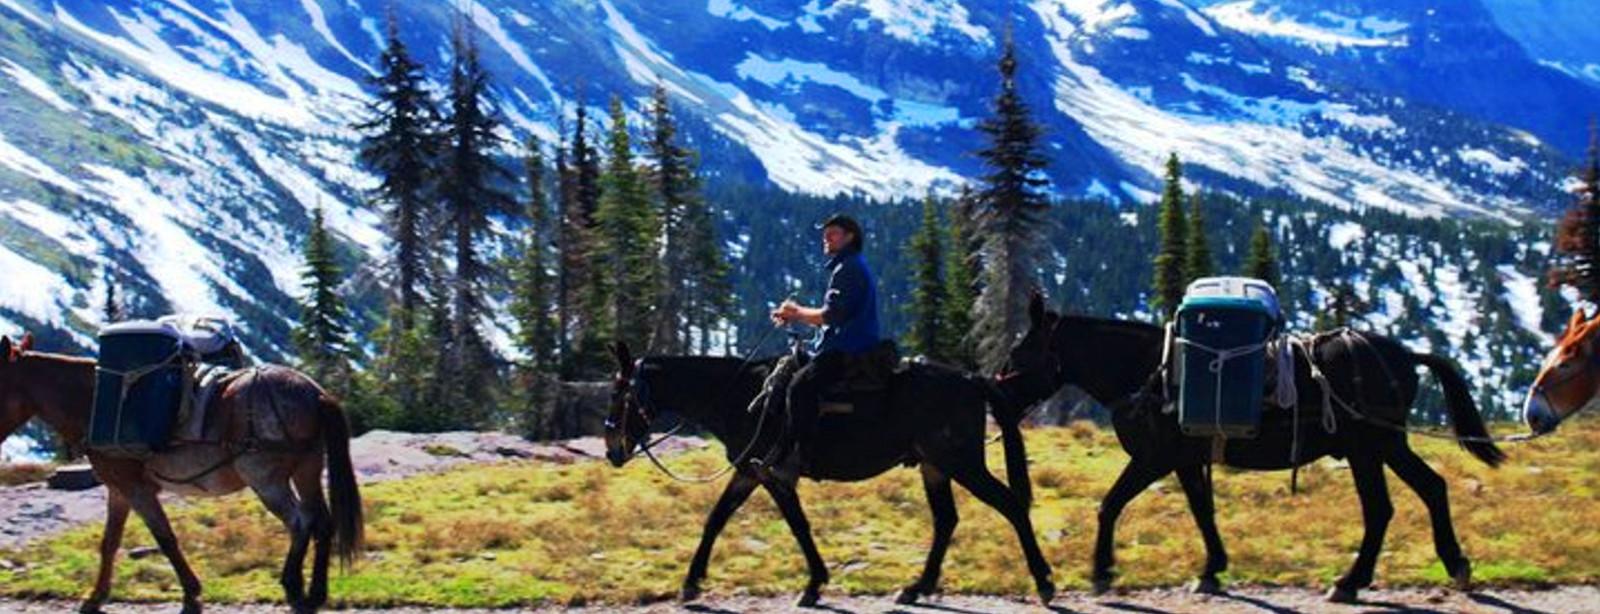 Montana Wilderness Pack Trips | Horseback Trail Riding